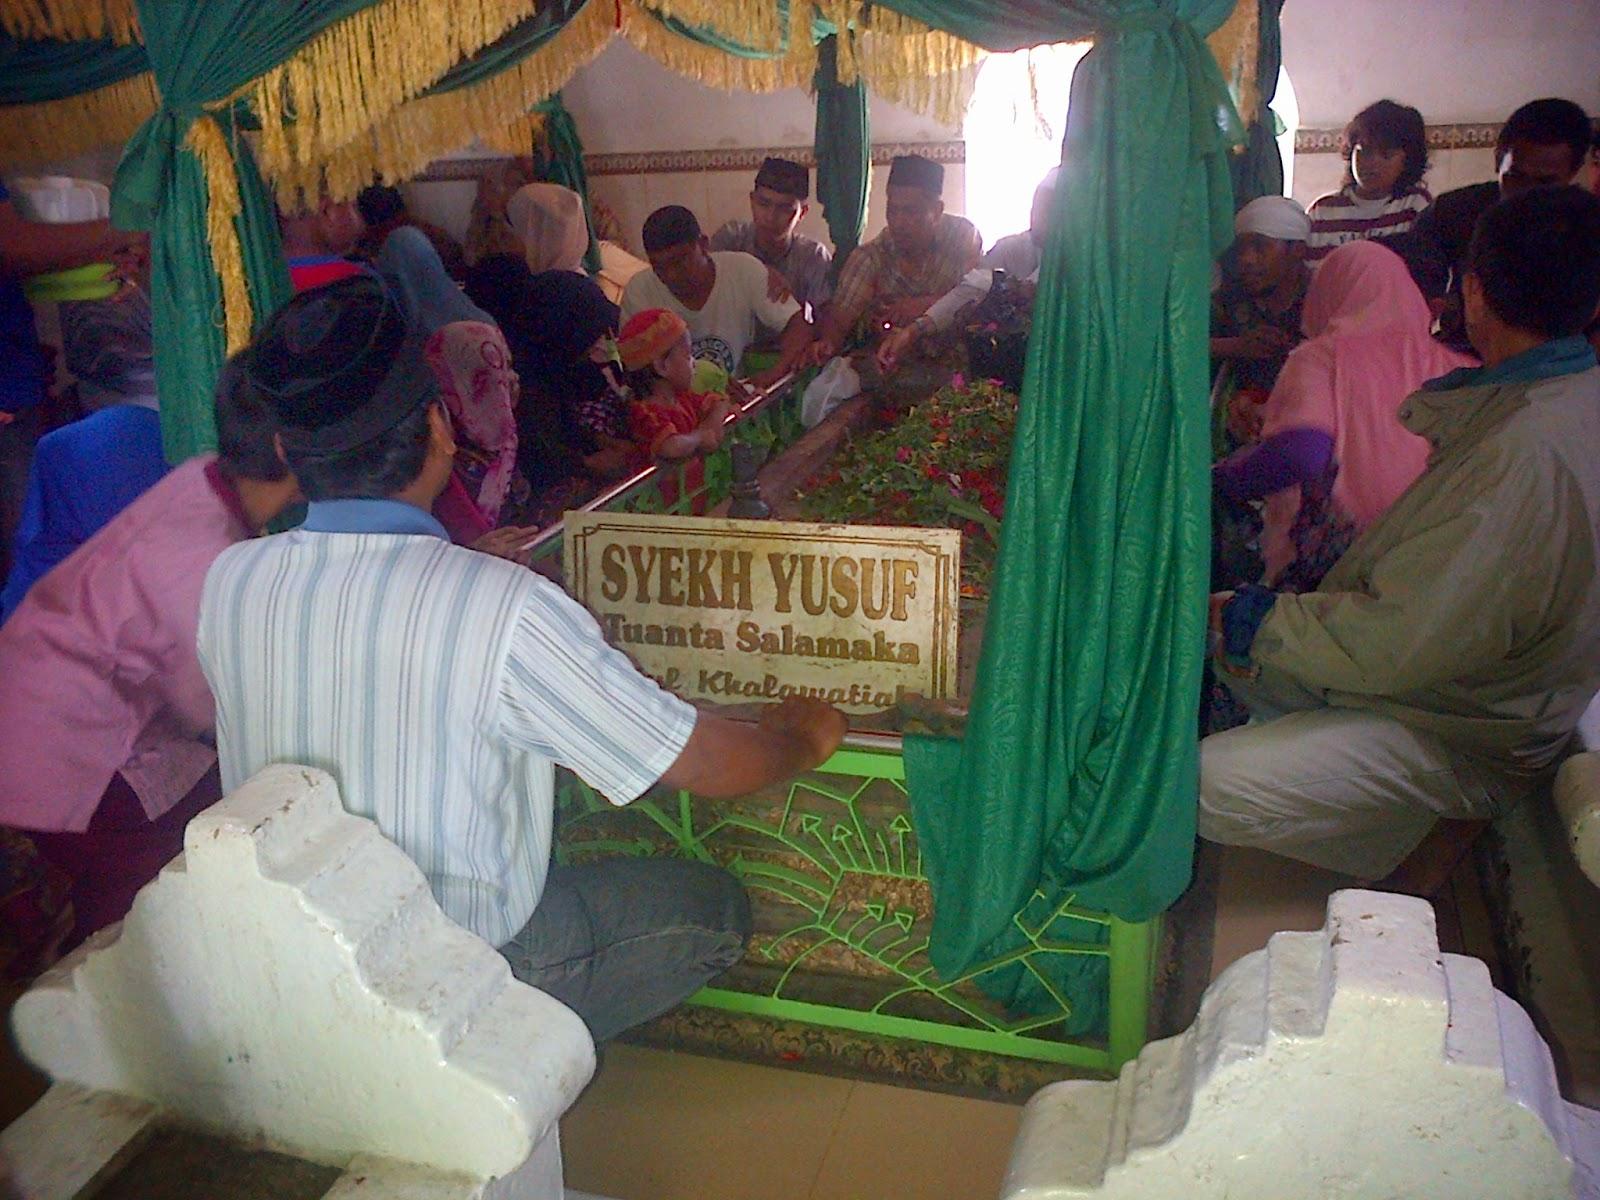 Latar Belakang : Fenomena Makam Syekh Yusuf